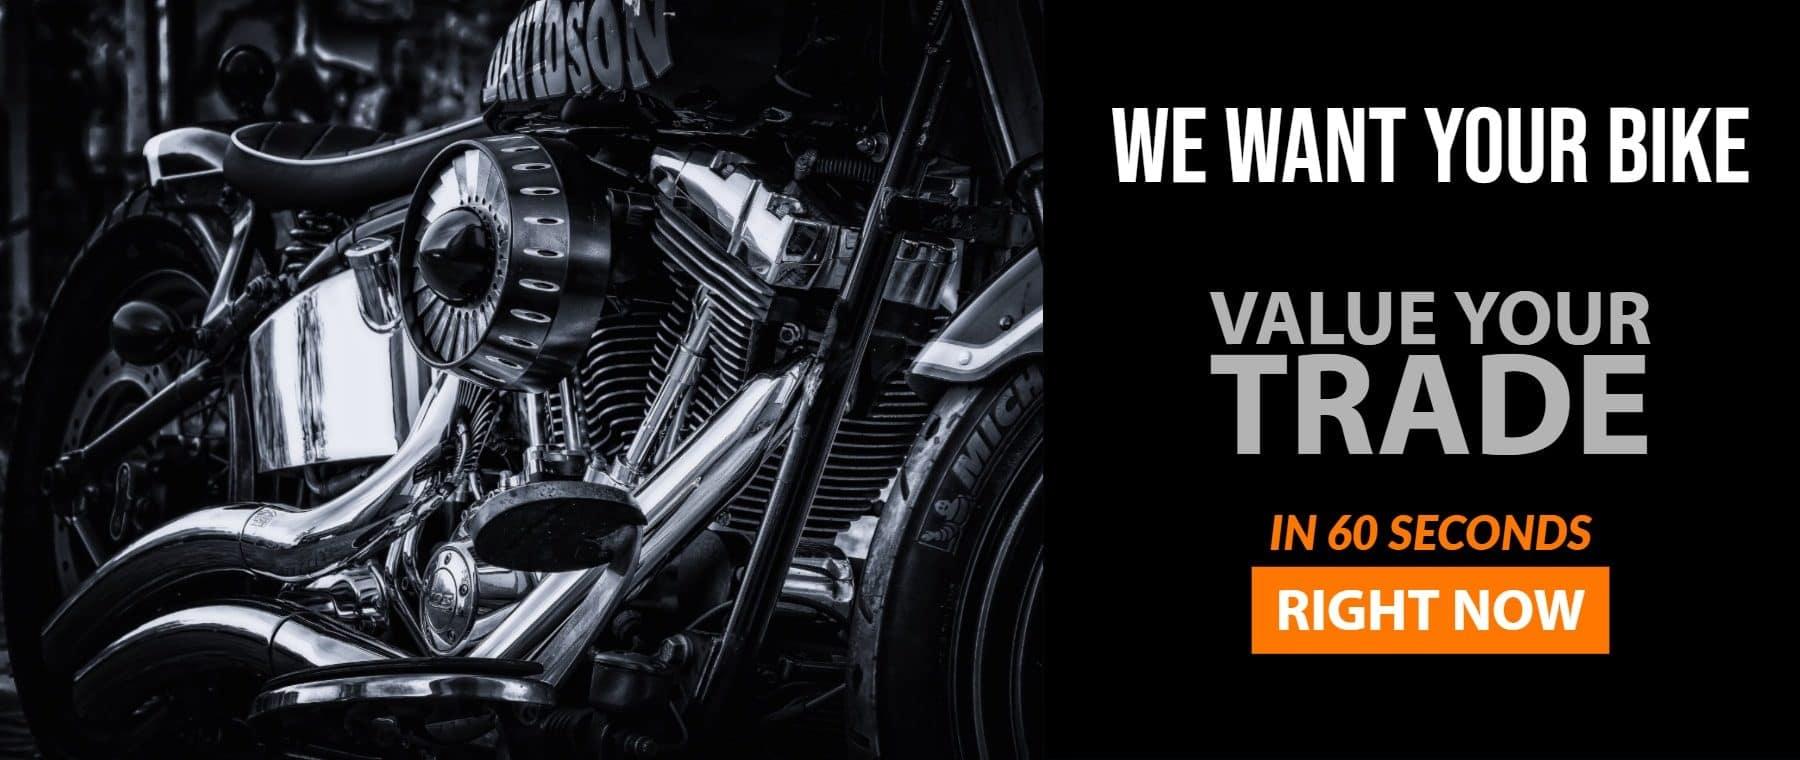 jd power bike trade in value